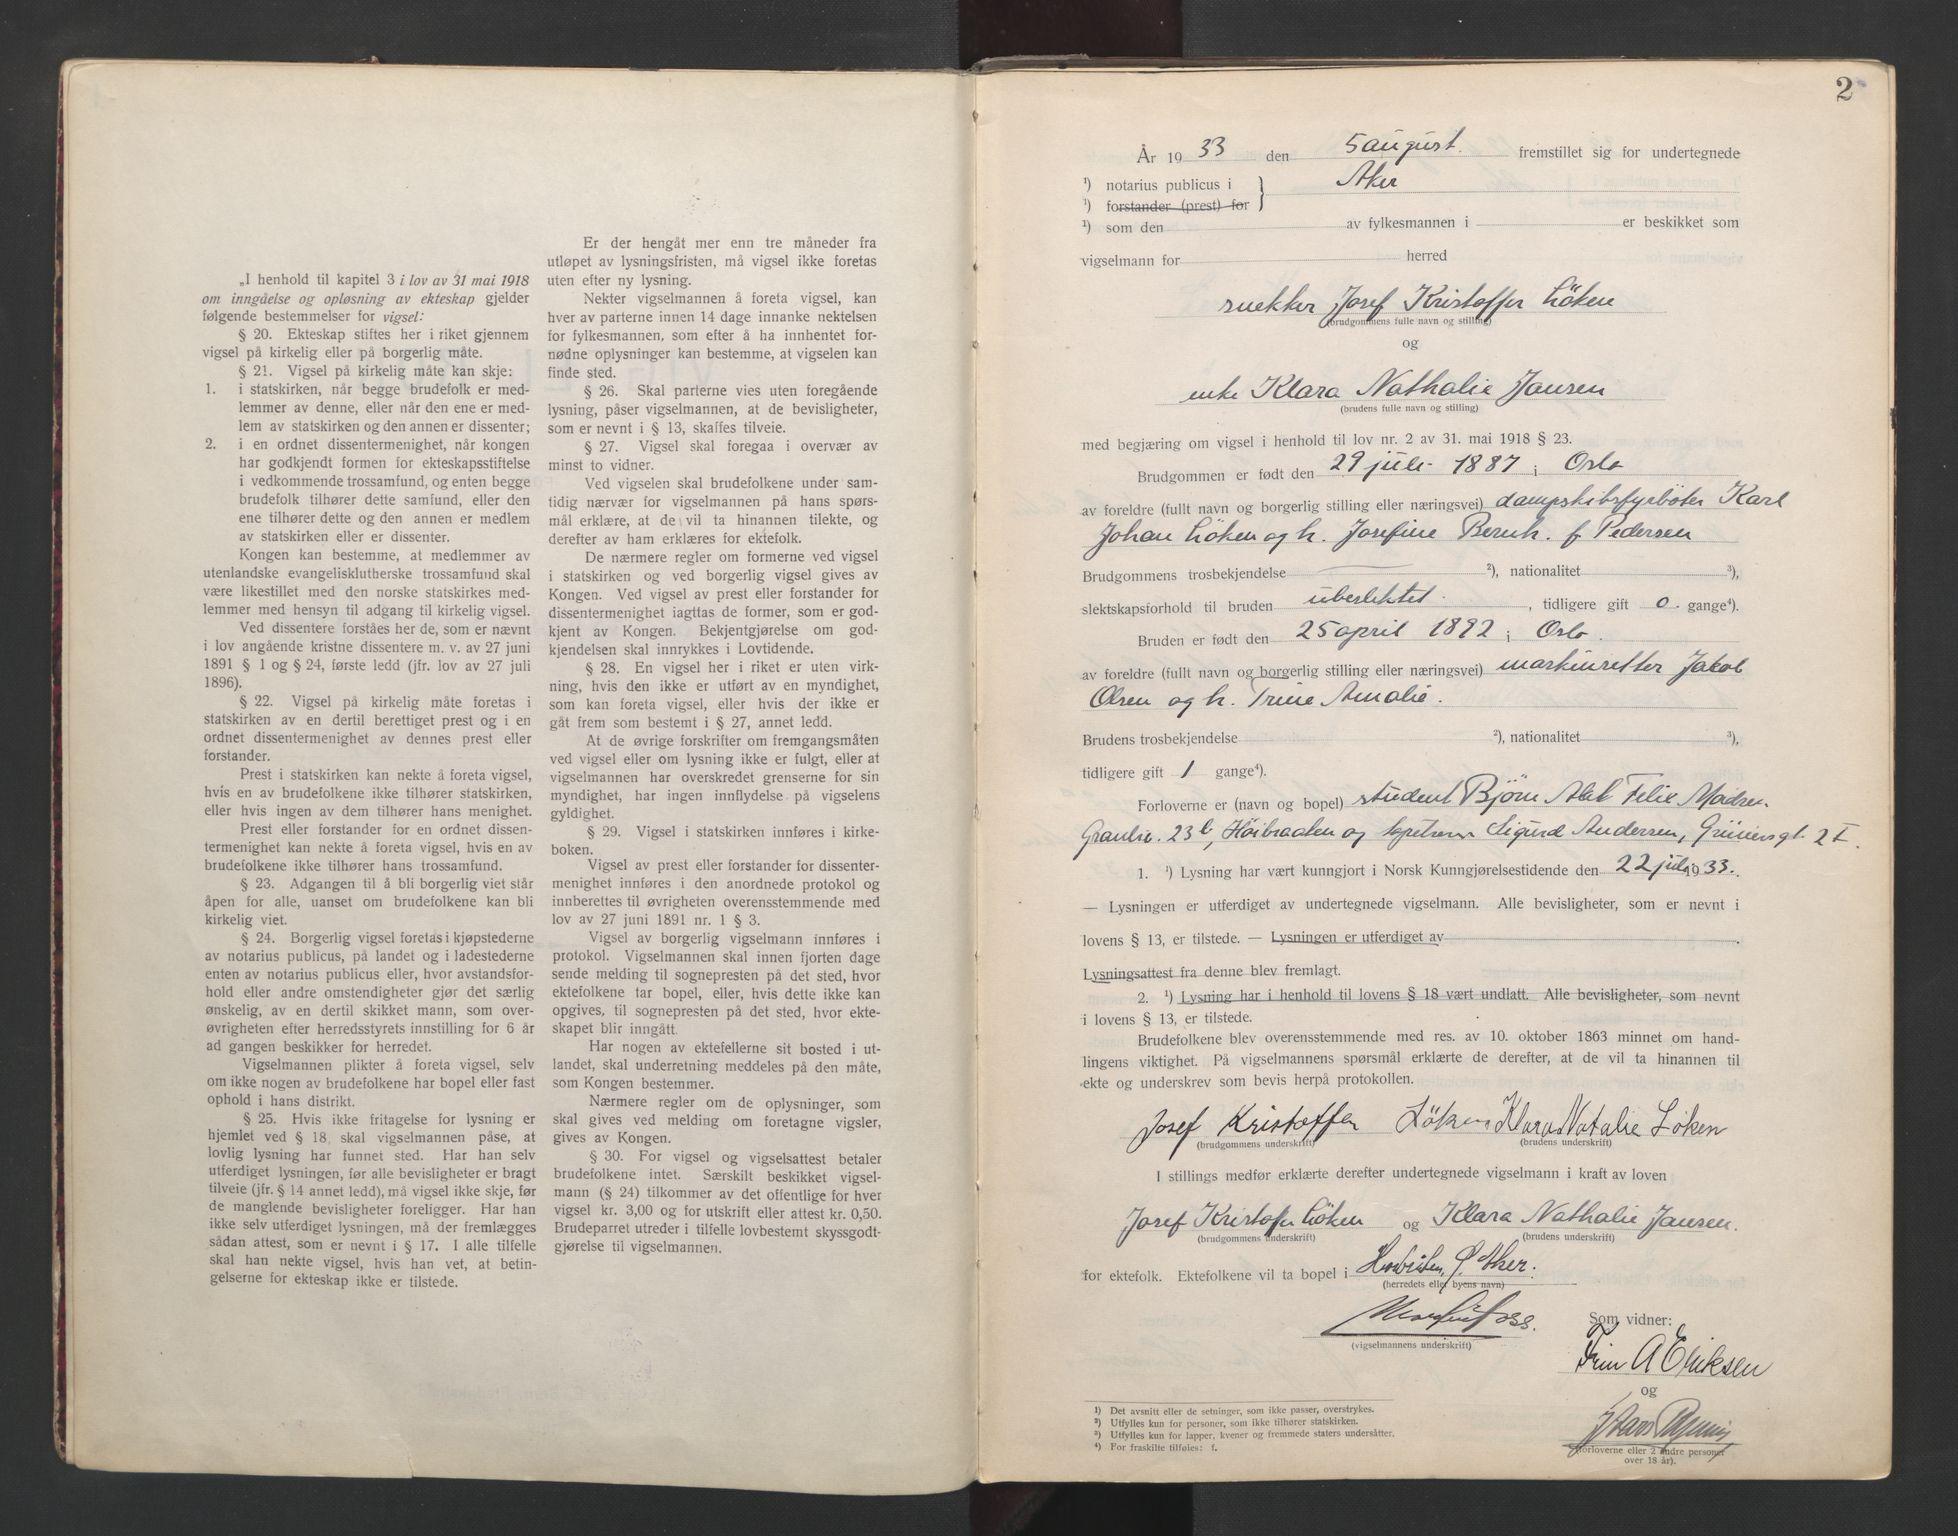 SAO, Aker sorenskriveri, L/Lc/Lcb/L0007: Vigselprotokoll, 1933-1935, s. 2